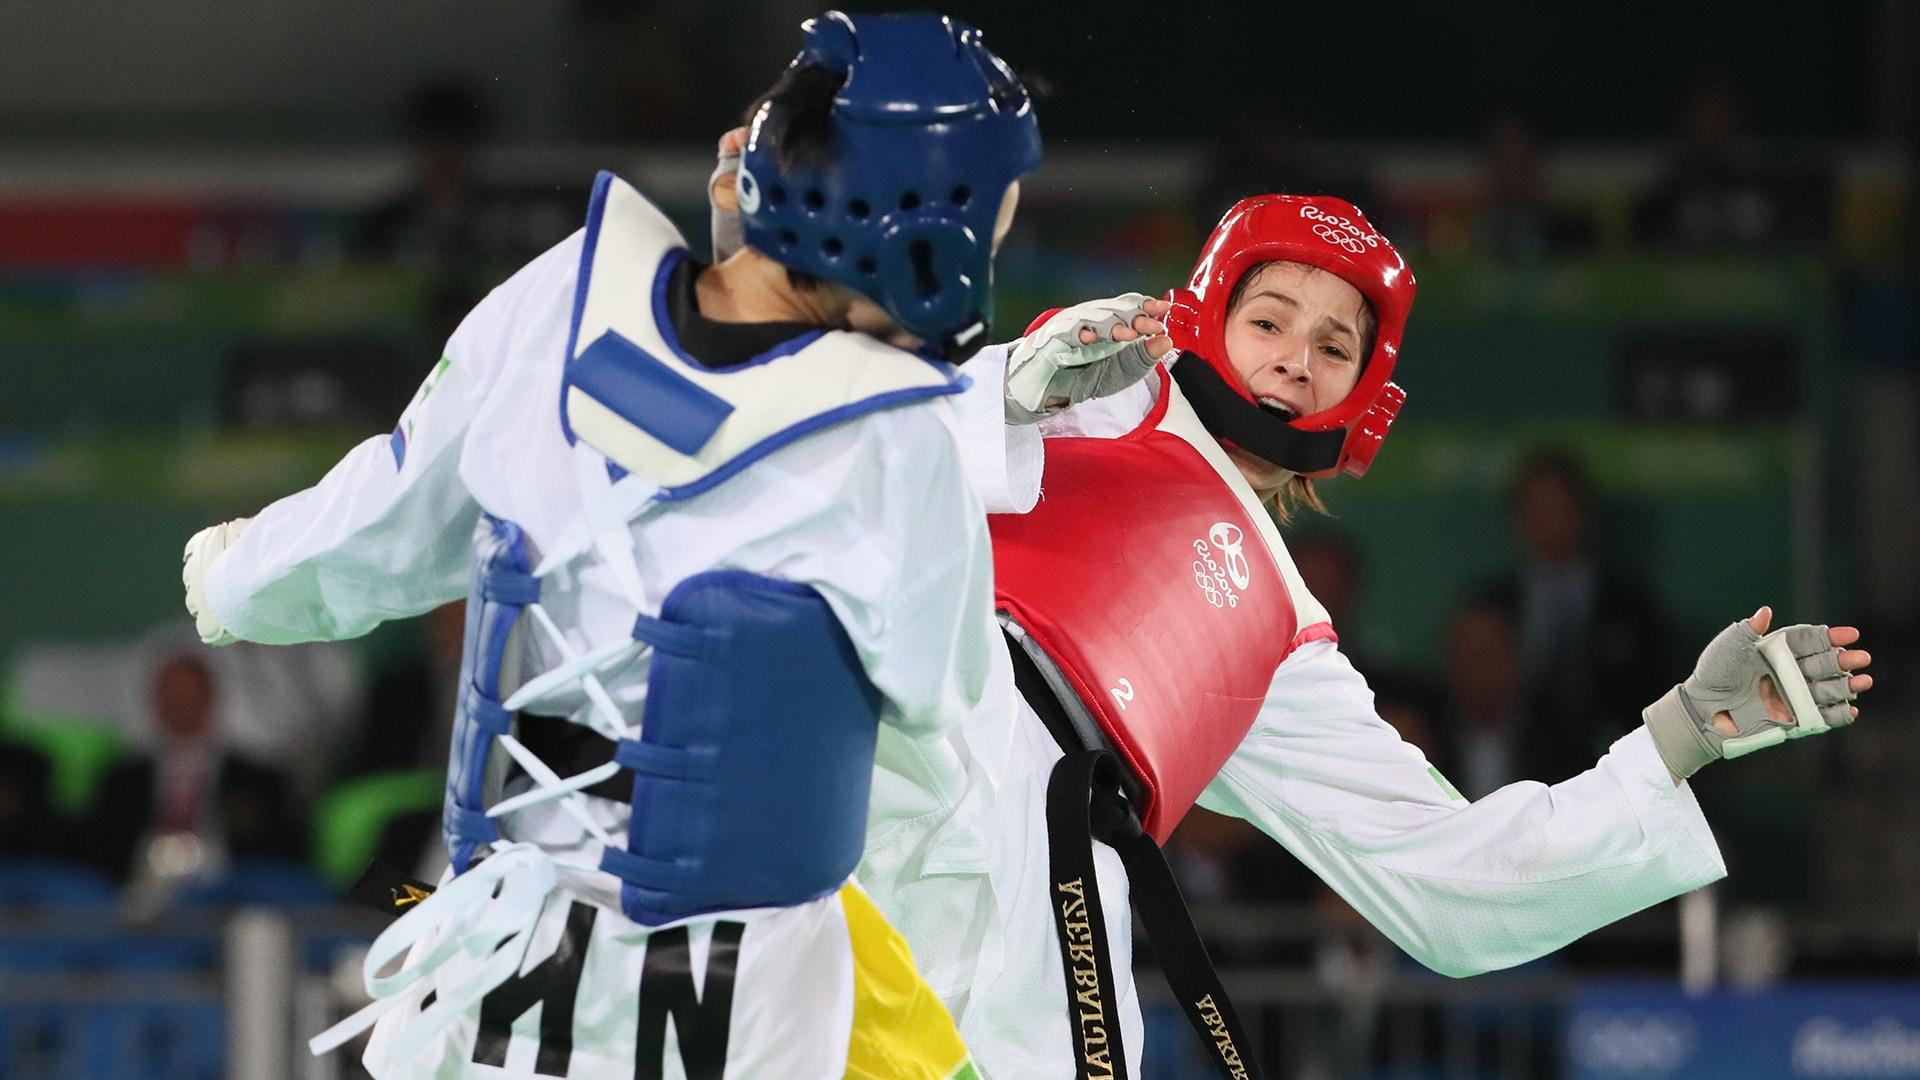 How to watch taekwondo at the Tokyo Olympics